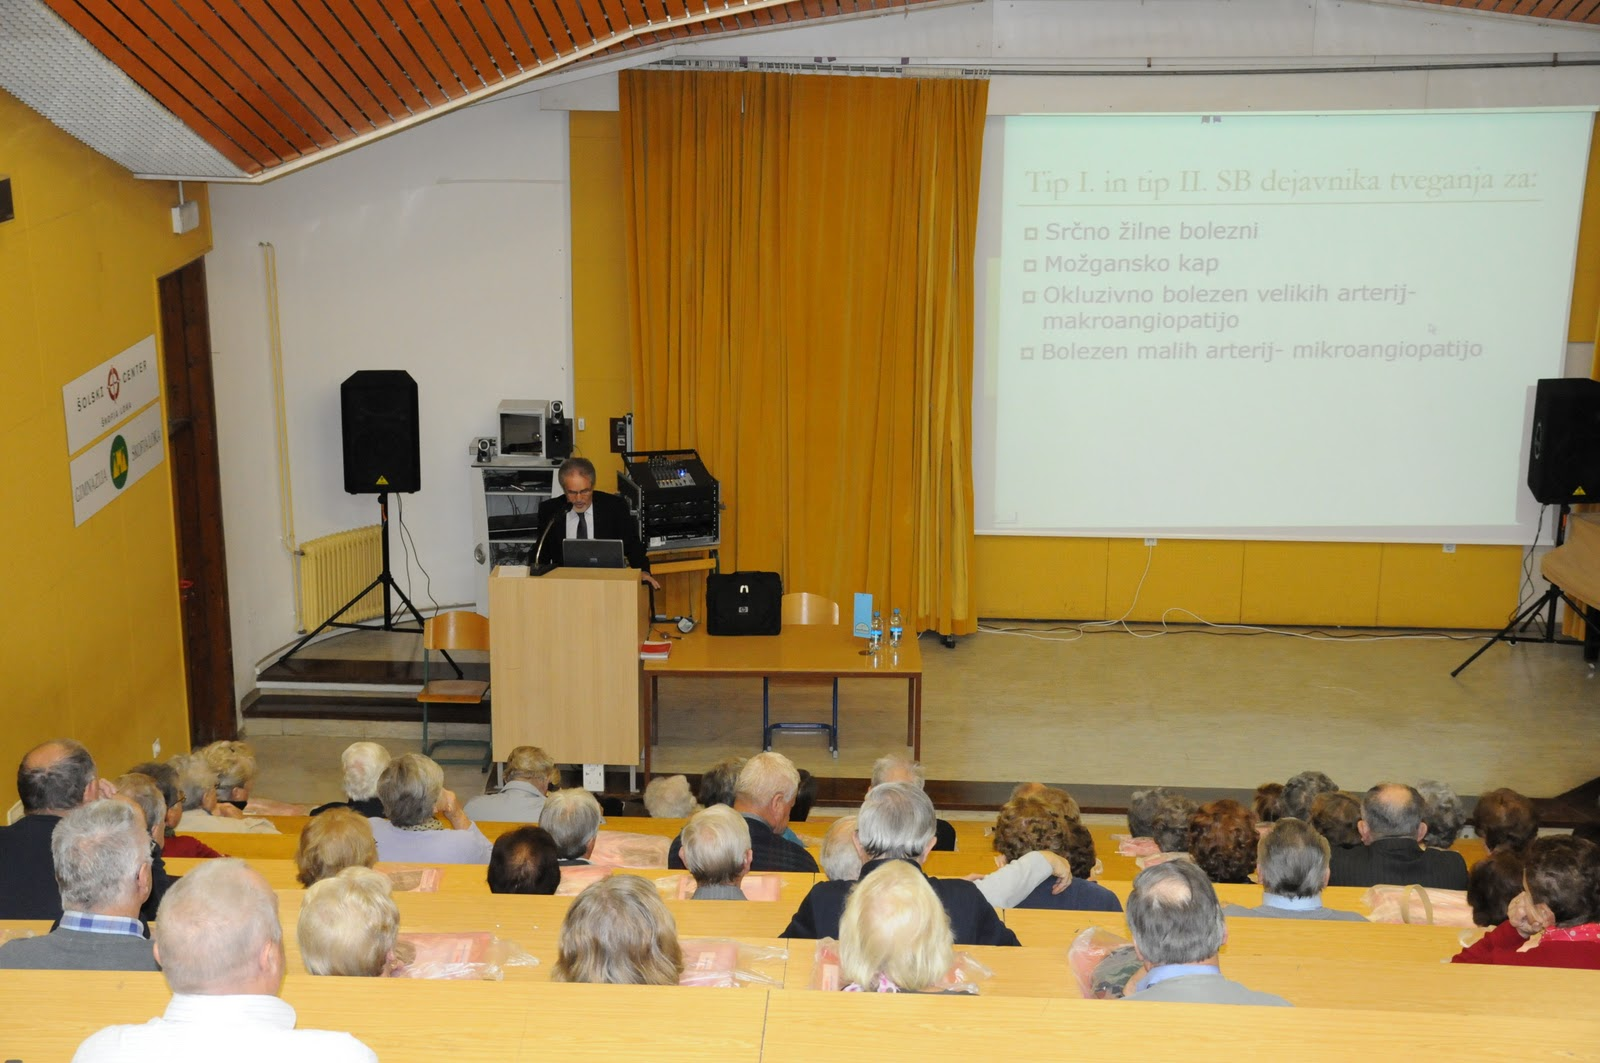 Predavanje, dr. Camlek - oktober 2011 - DSC_3882.JPG